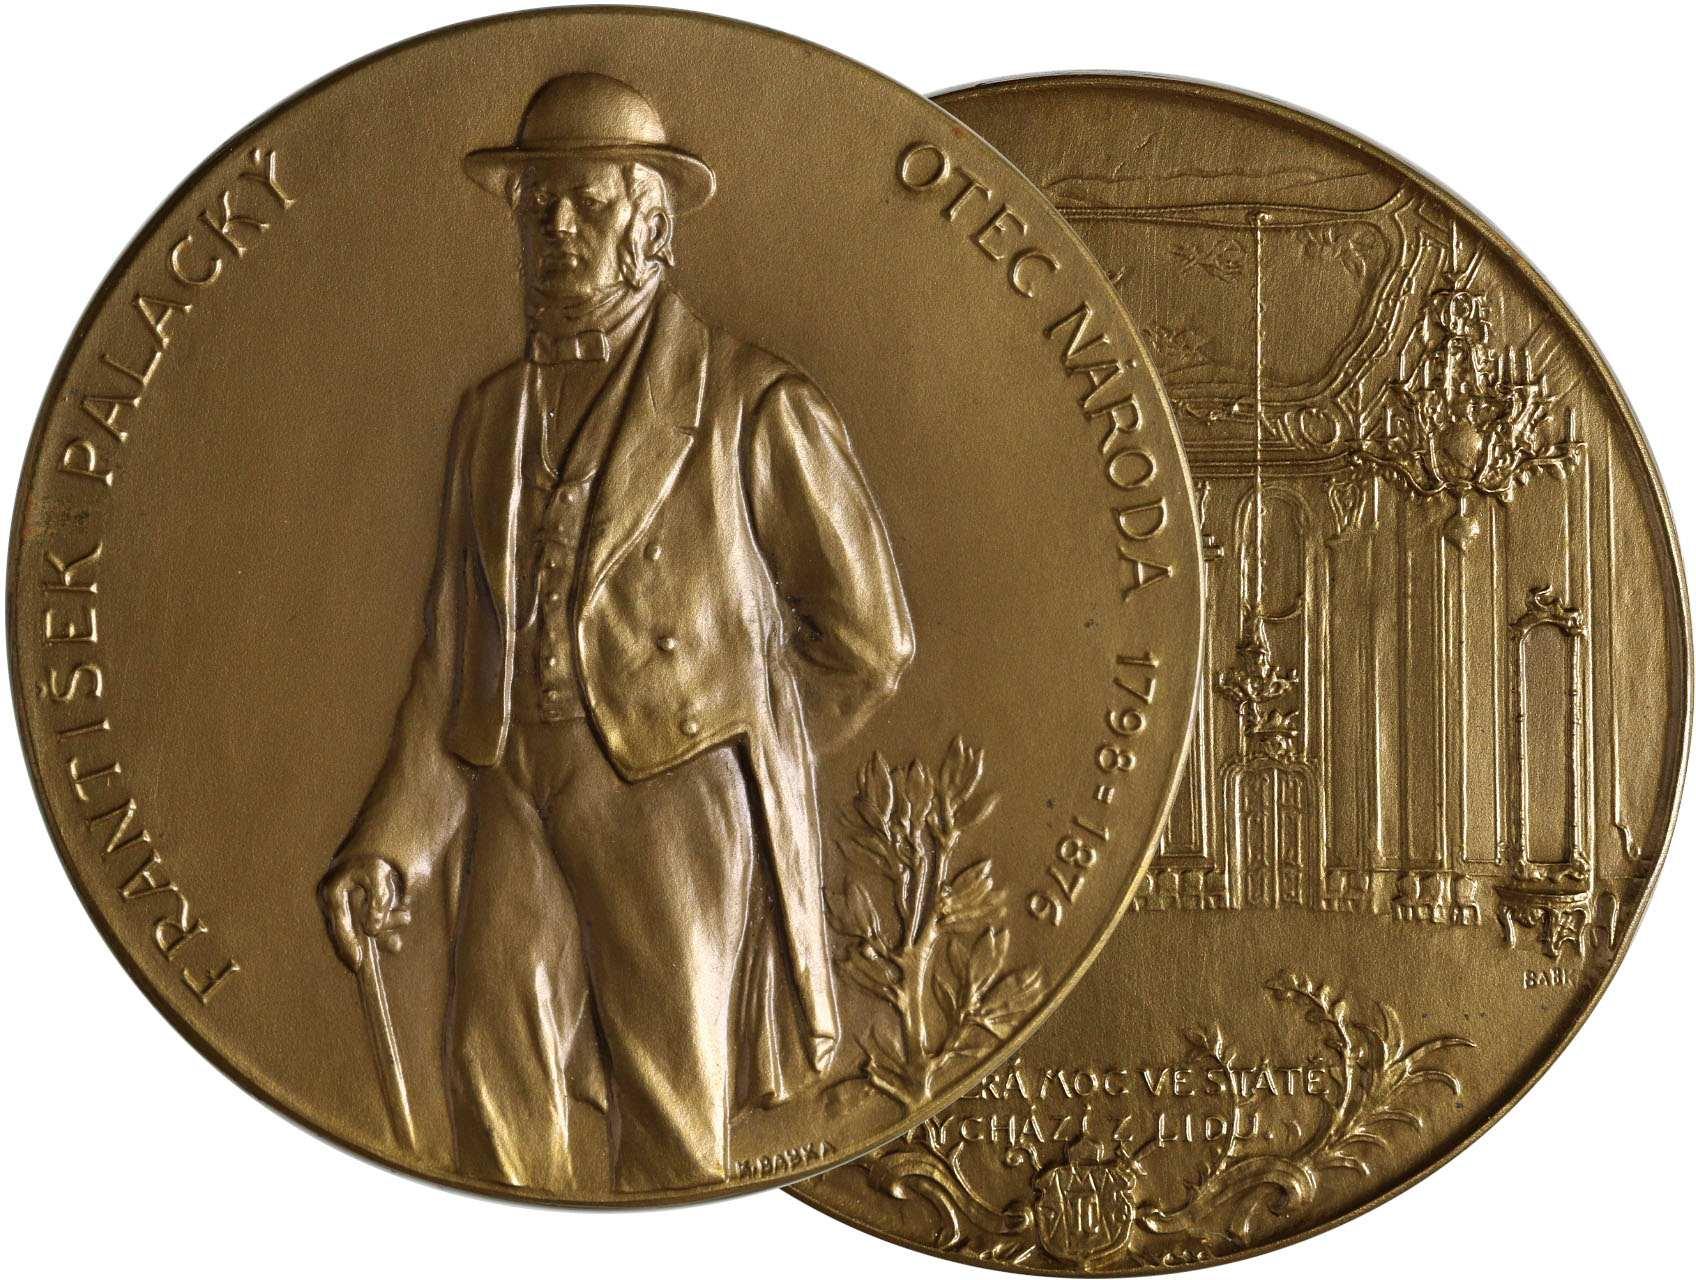 Babka Karel 1880-1953 - AE medaile František Palacký. Postava zleva, opis / Kroměřížský sněm. Bronz, 60 mm.